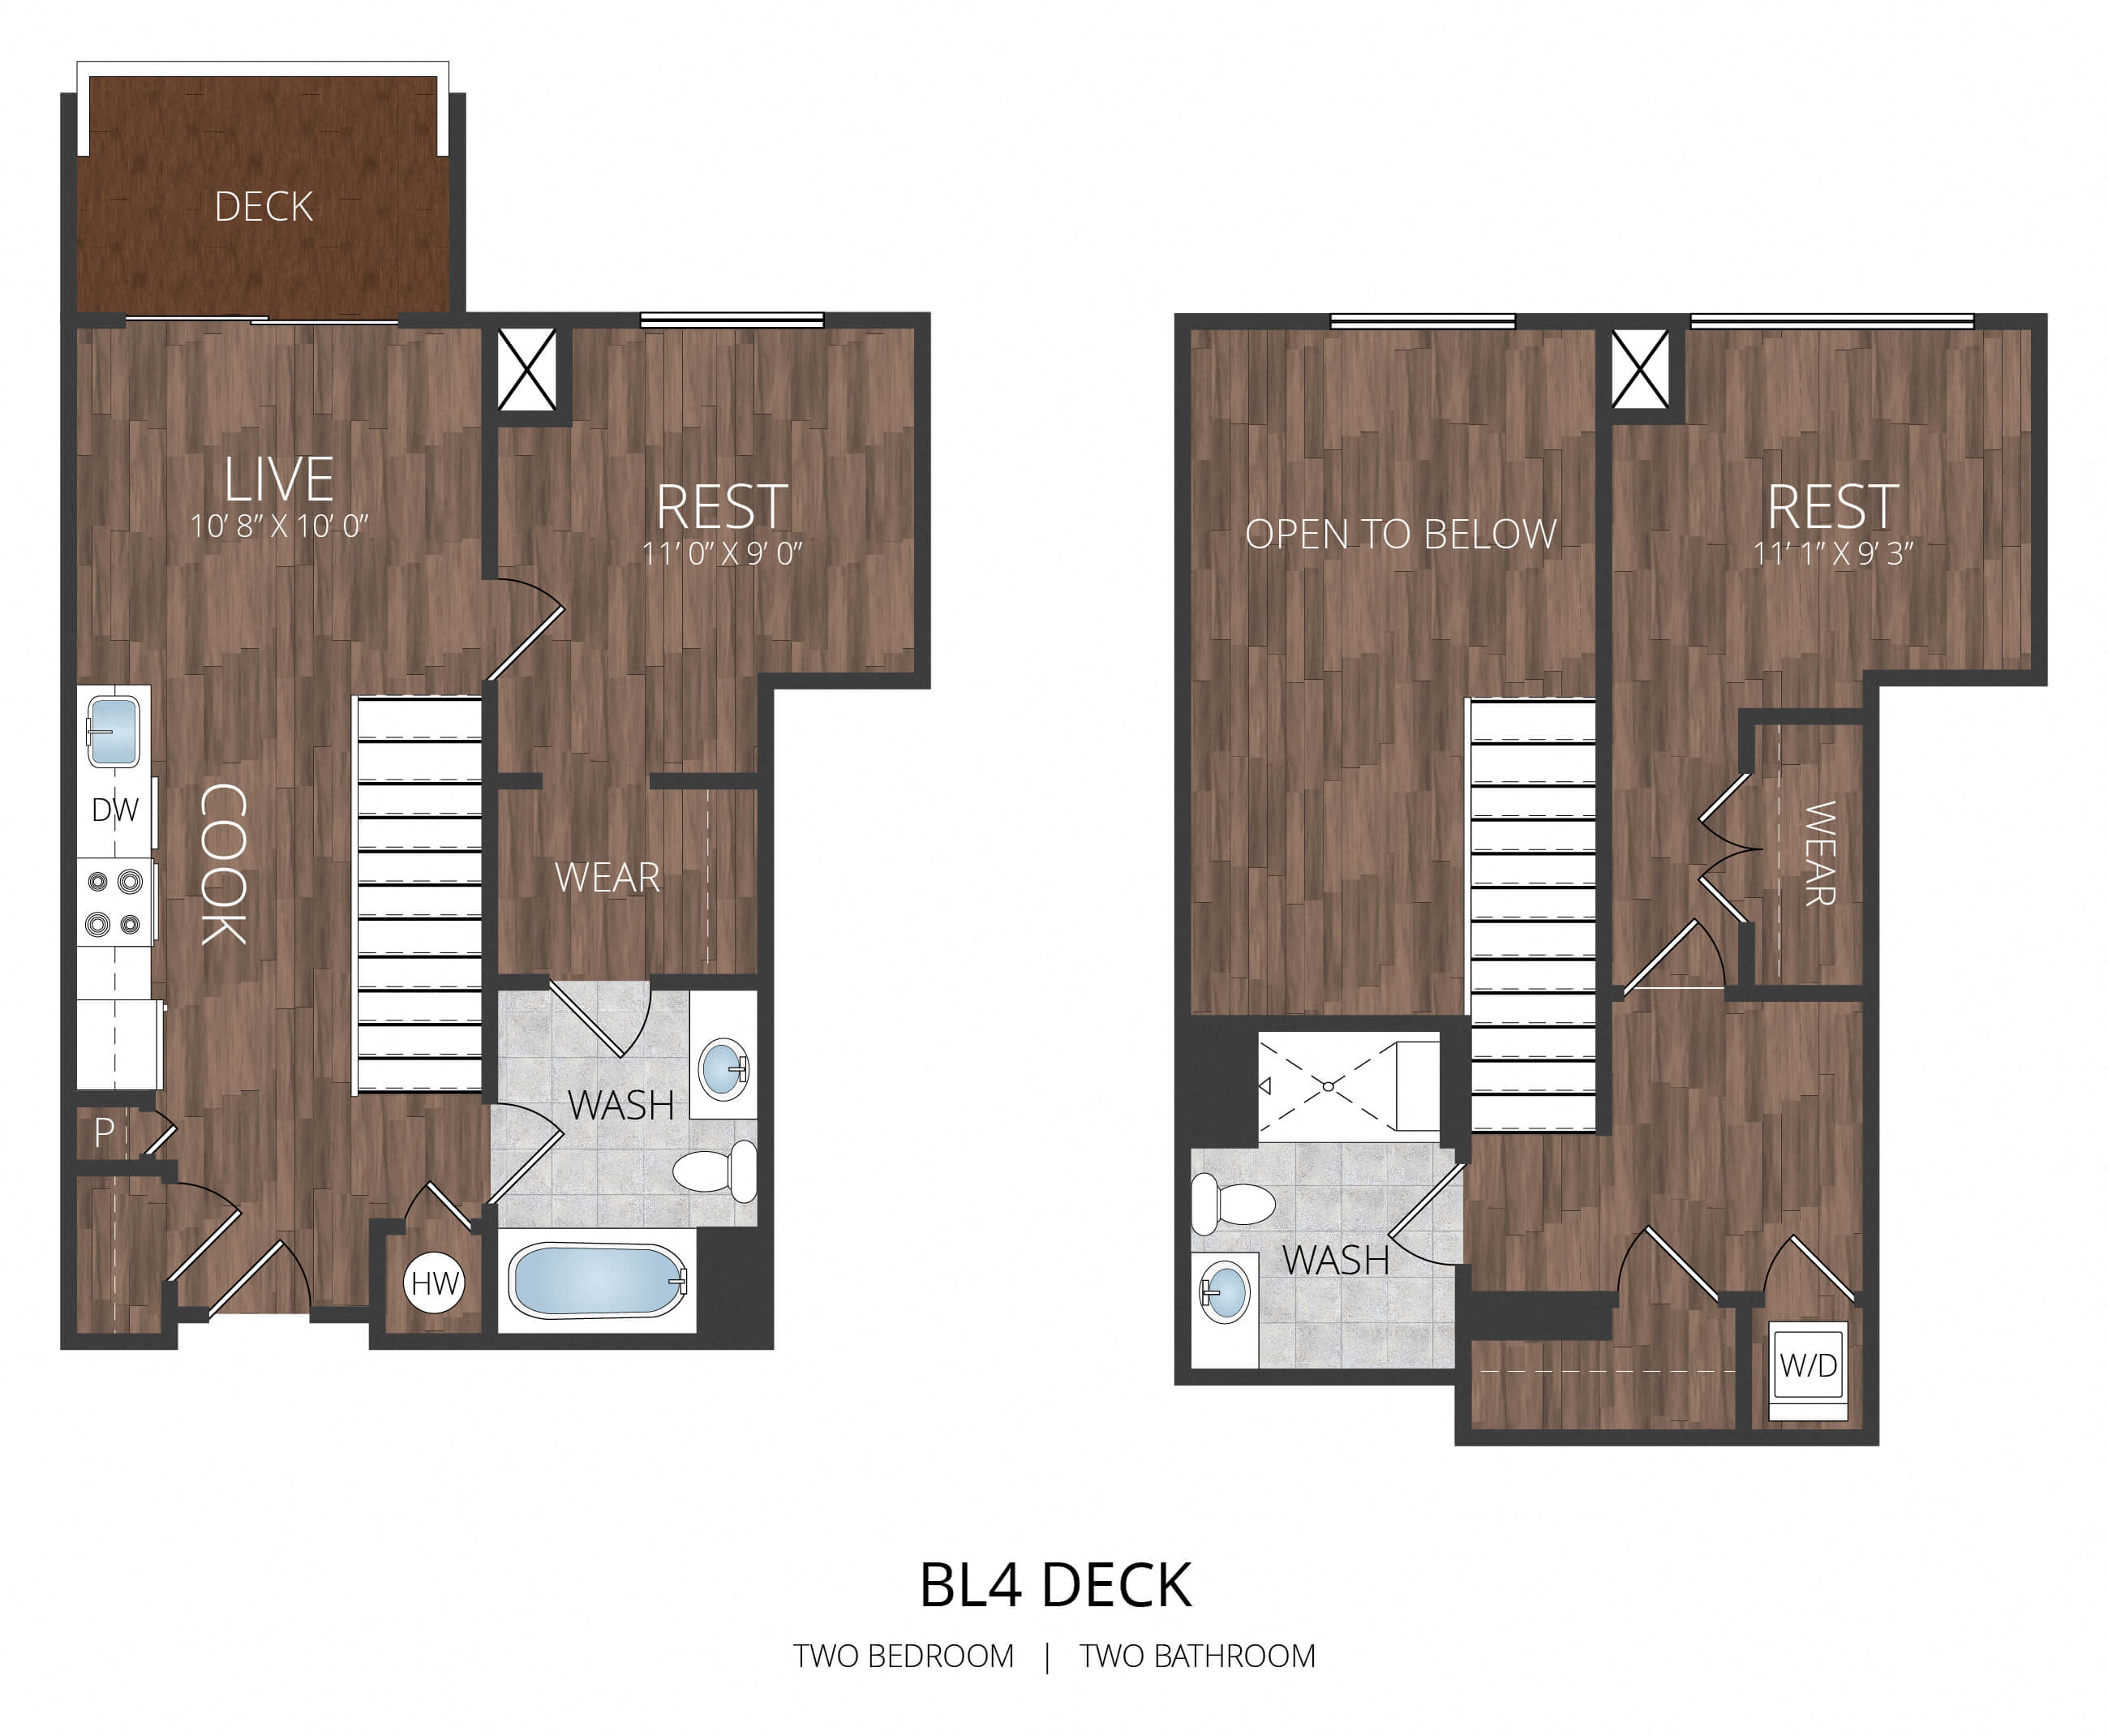 Penthouse BL4